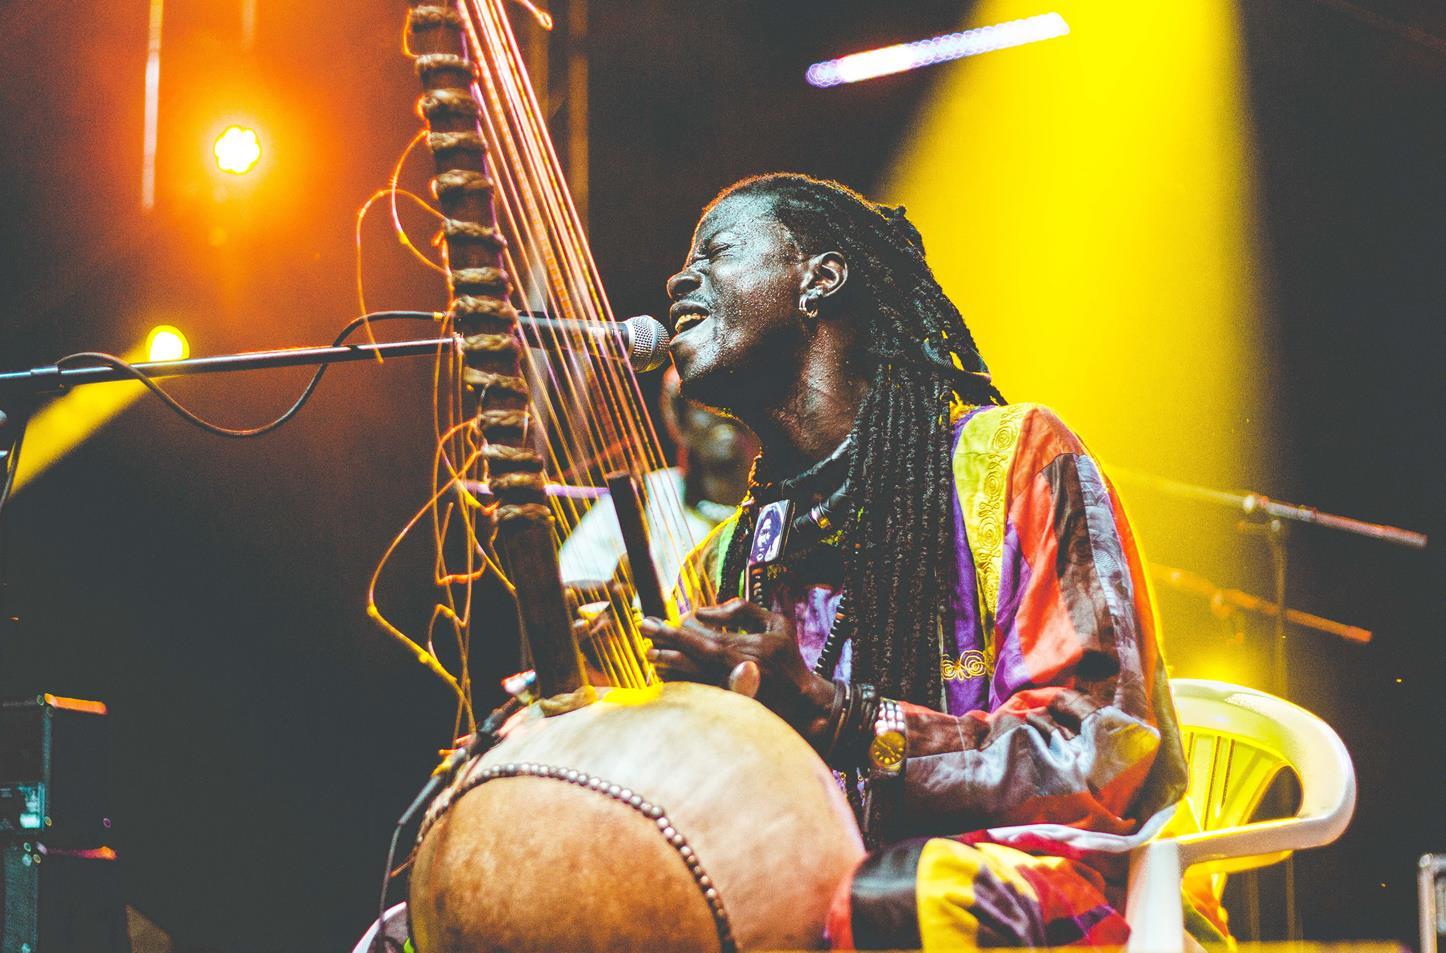 Ibrahima Cissokho